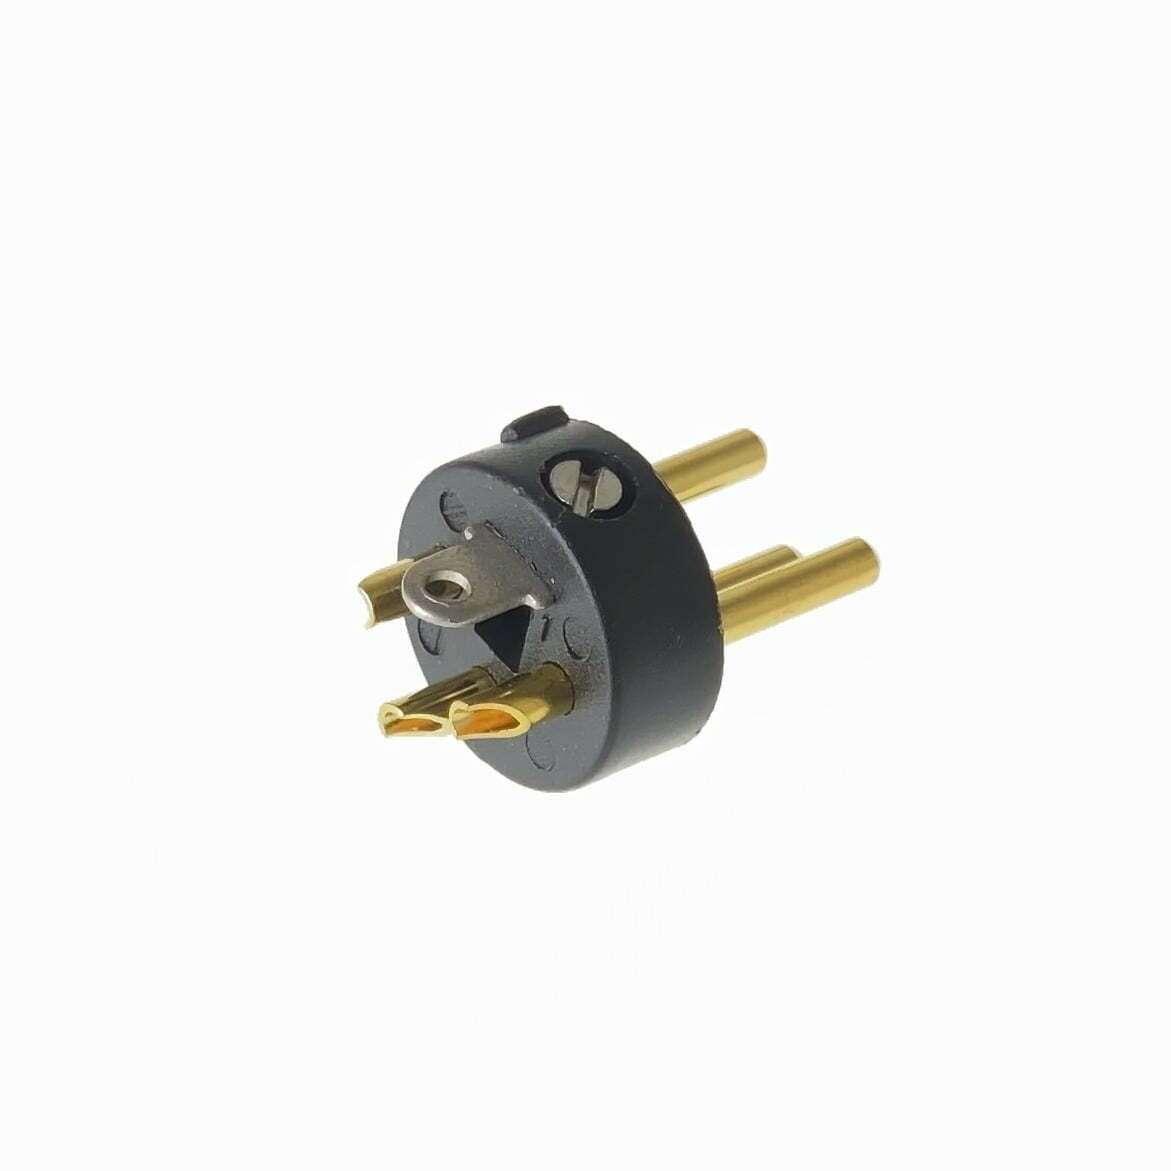 XLR Connector for Shure SM58, SM57, Beta 58 Microphones